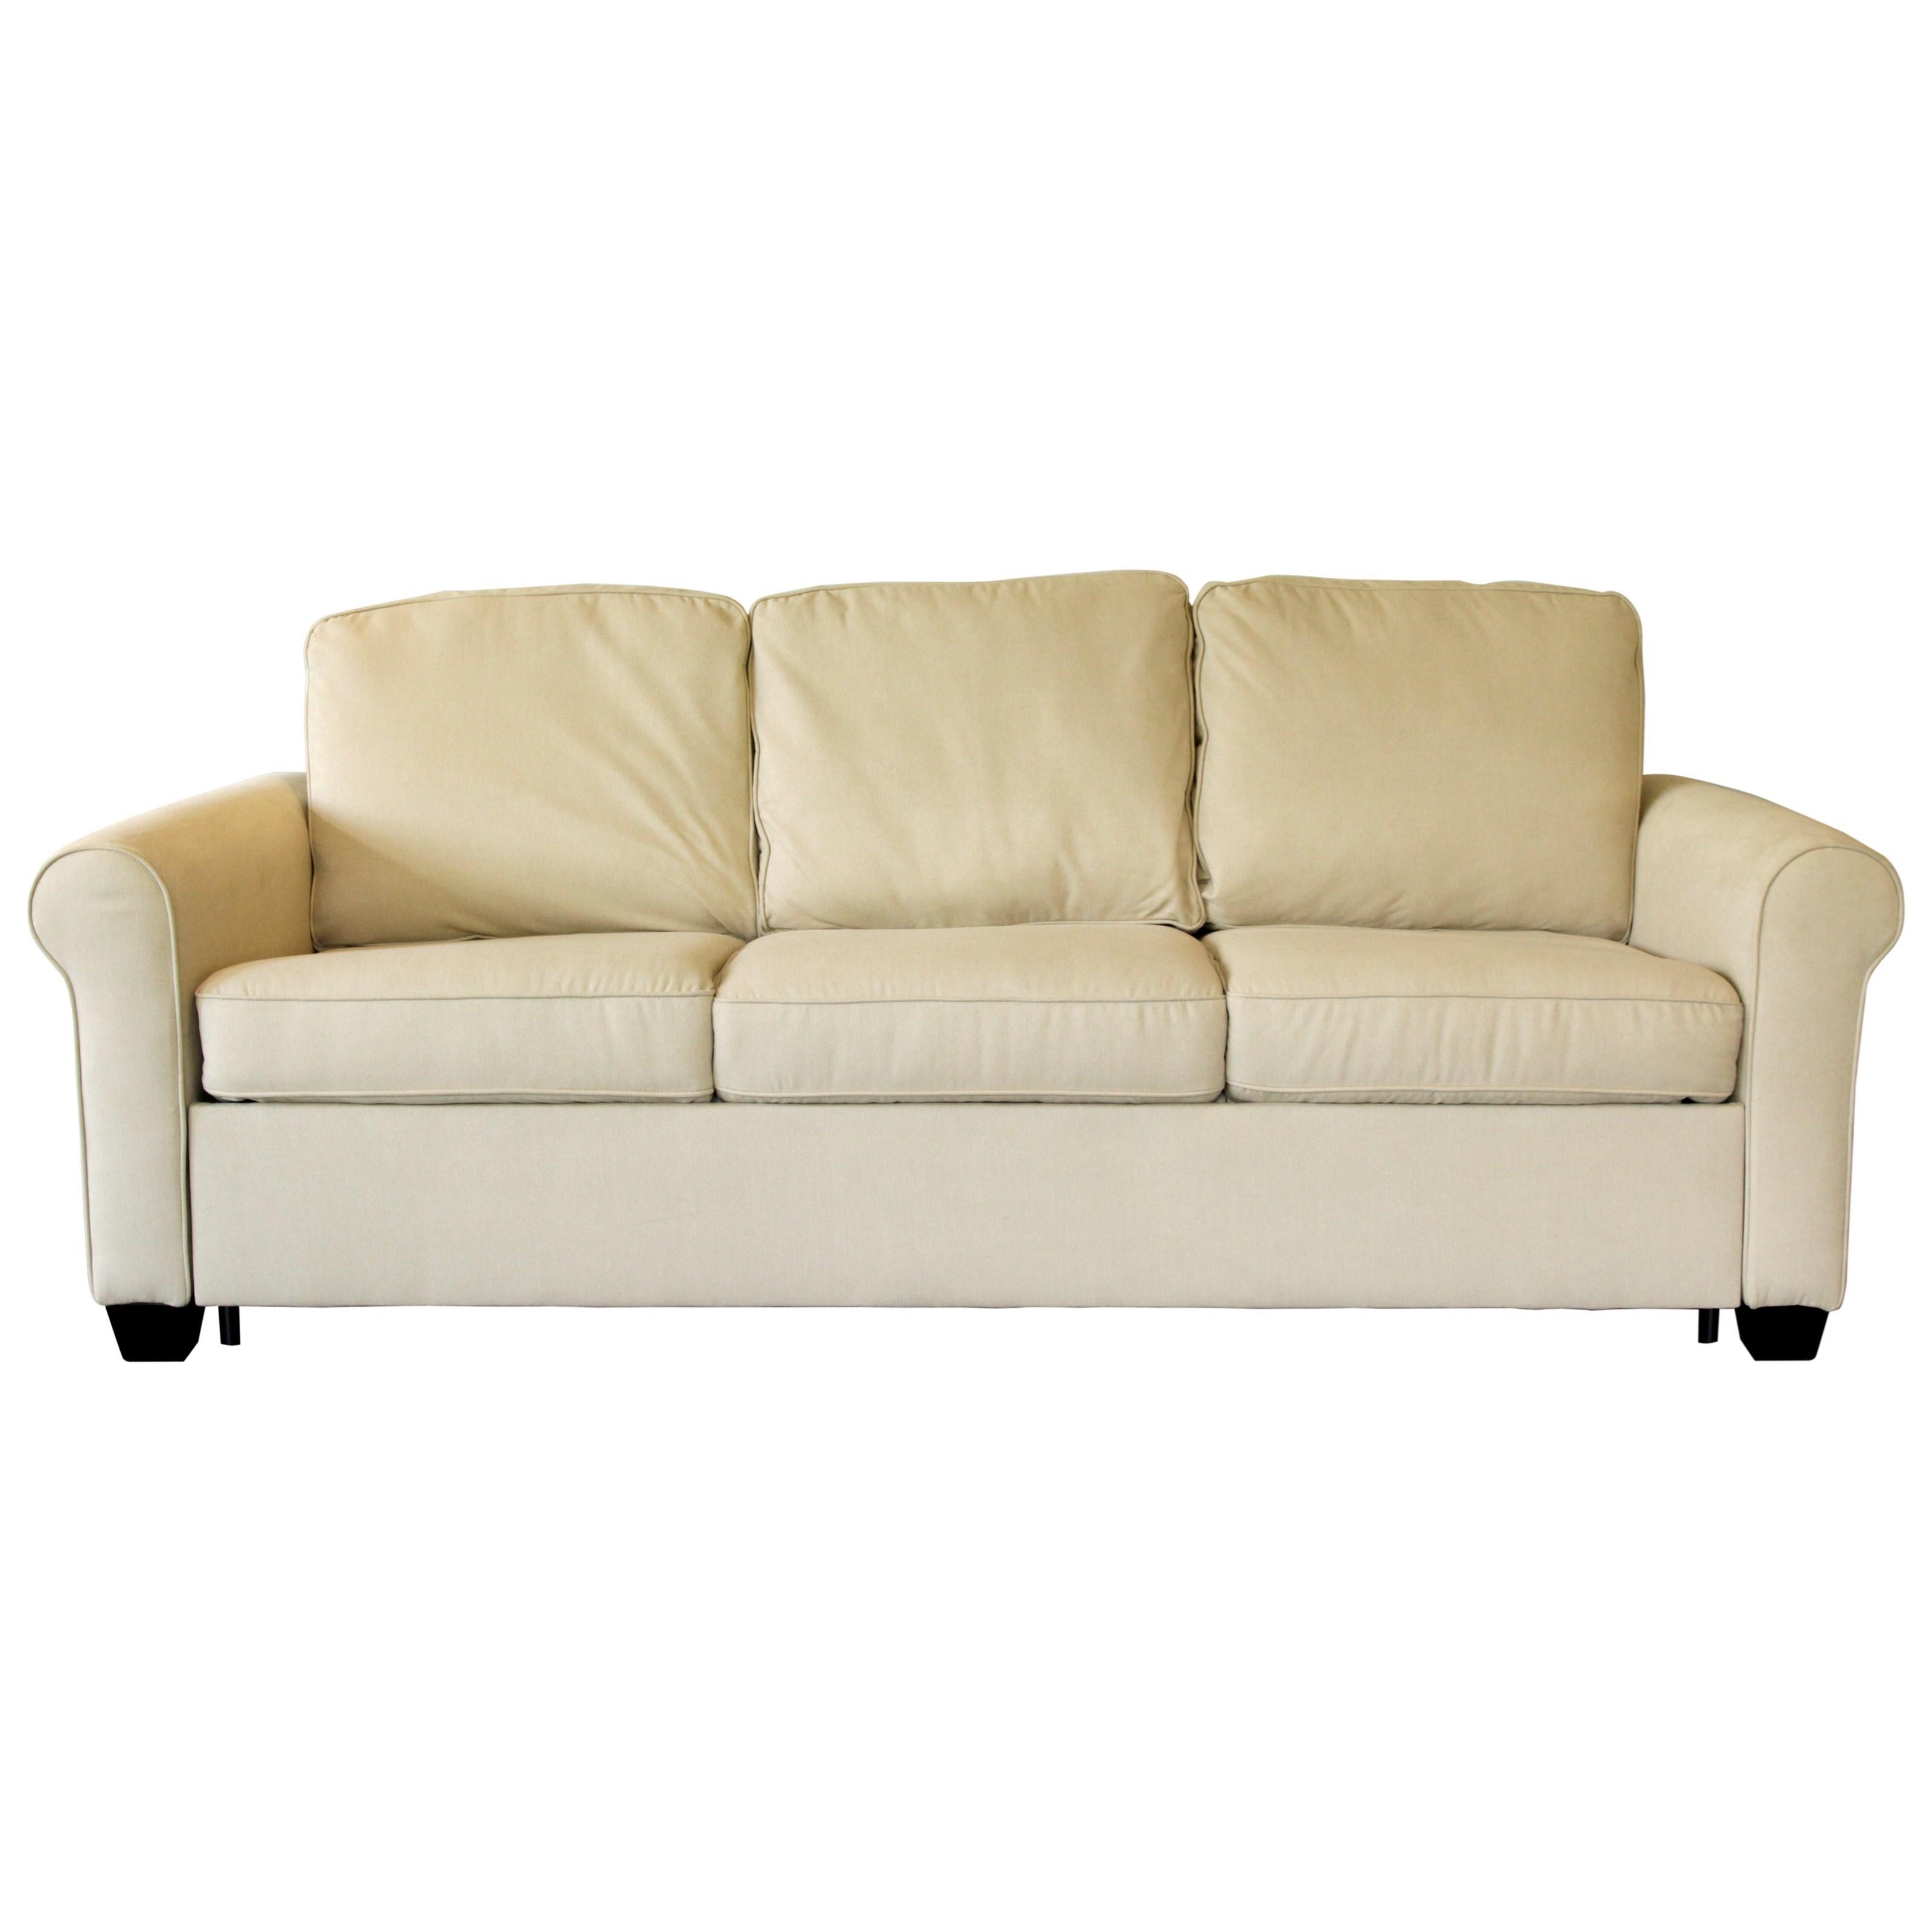 Swinden Double Sofa Sleeper by Palliser at Furniture and ApplianceMart